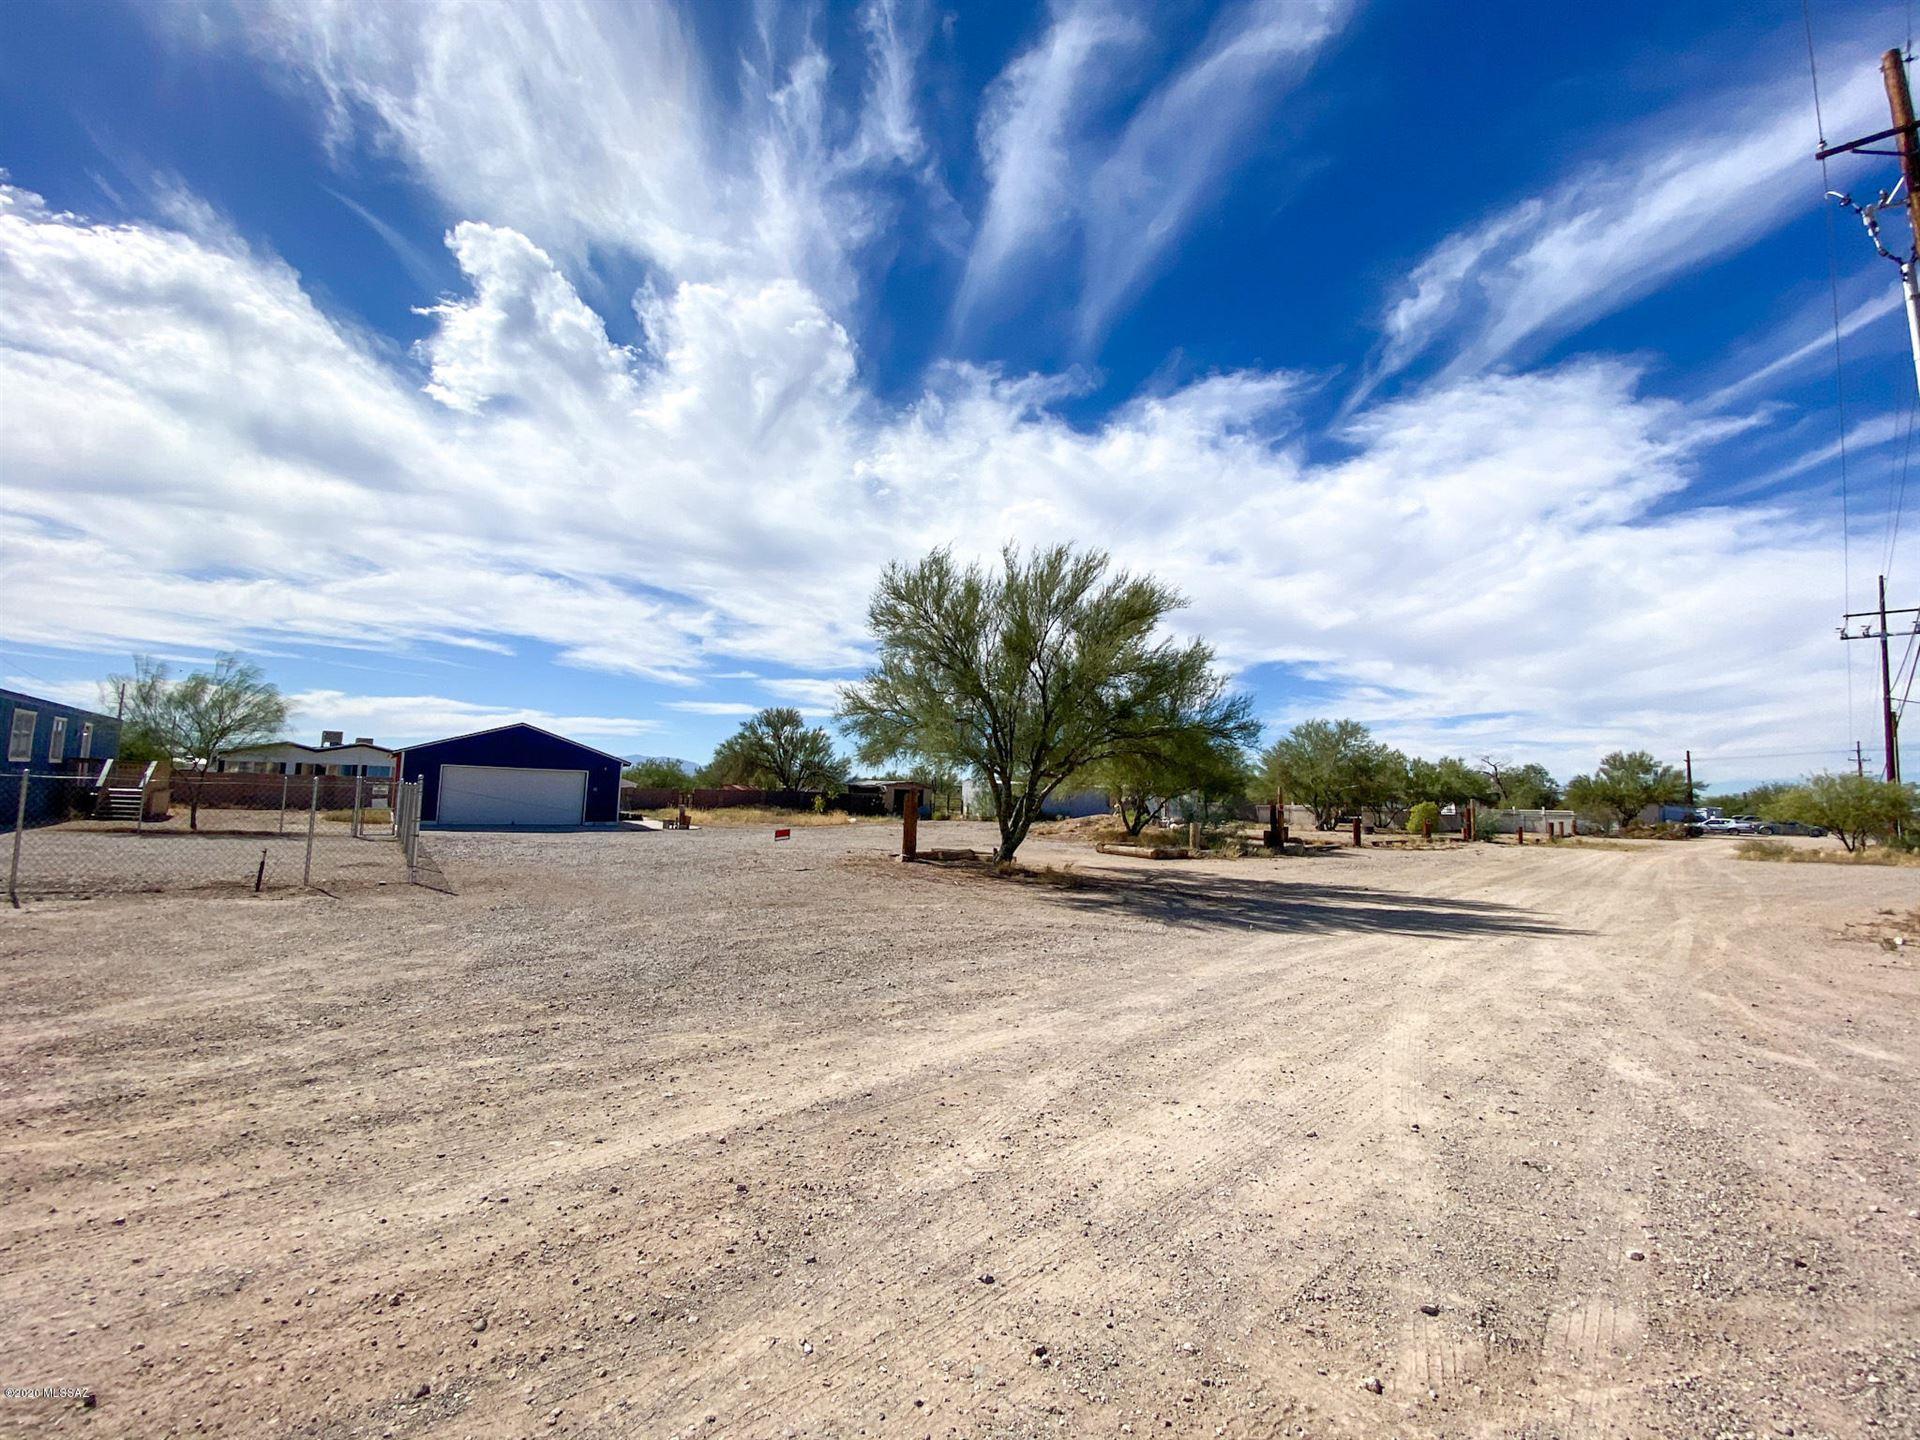 6201 W Bopp Road, Tucson, AZ 85735 - MLS#: 22027424